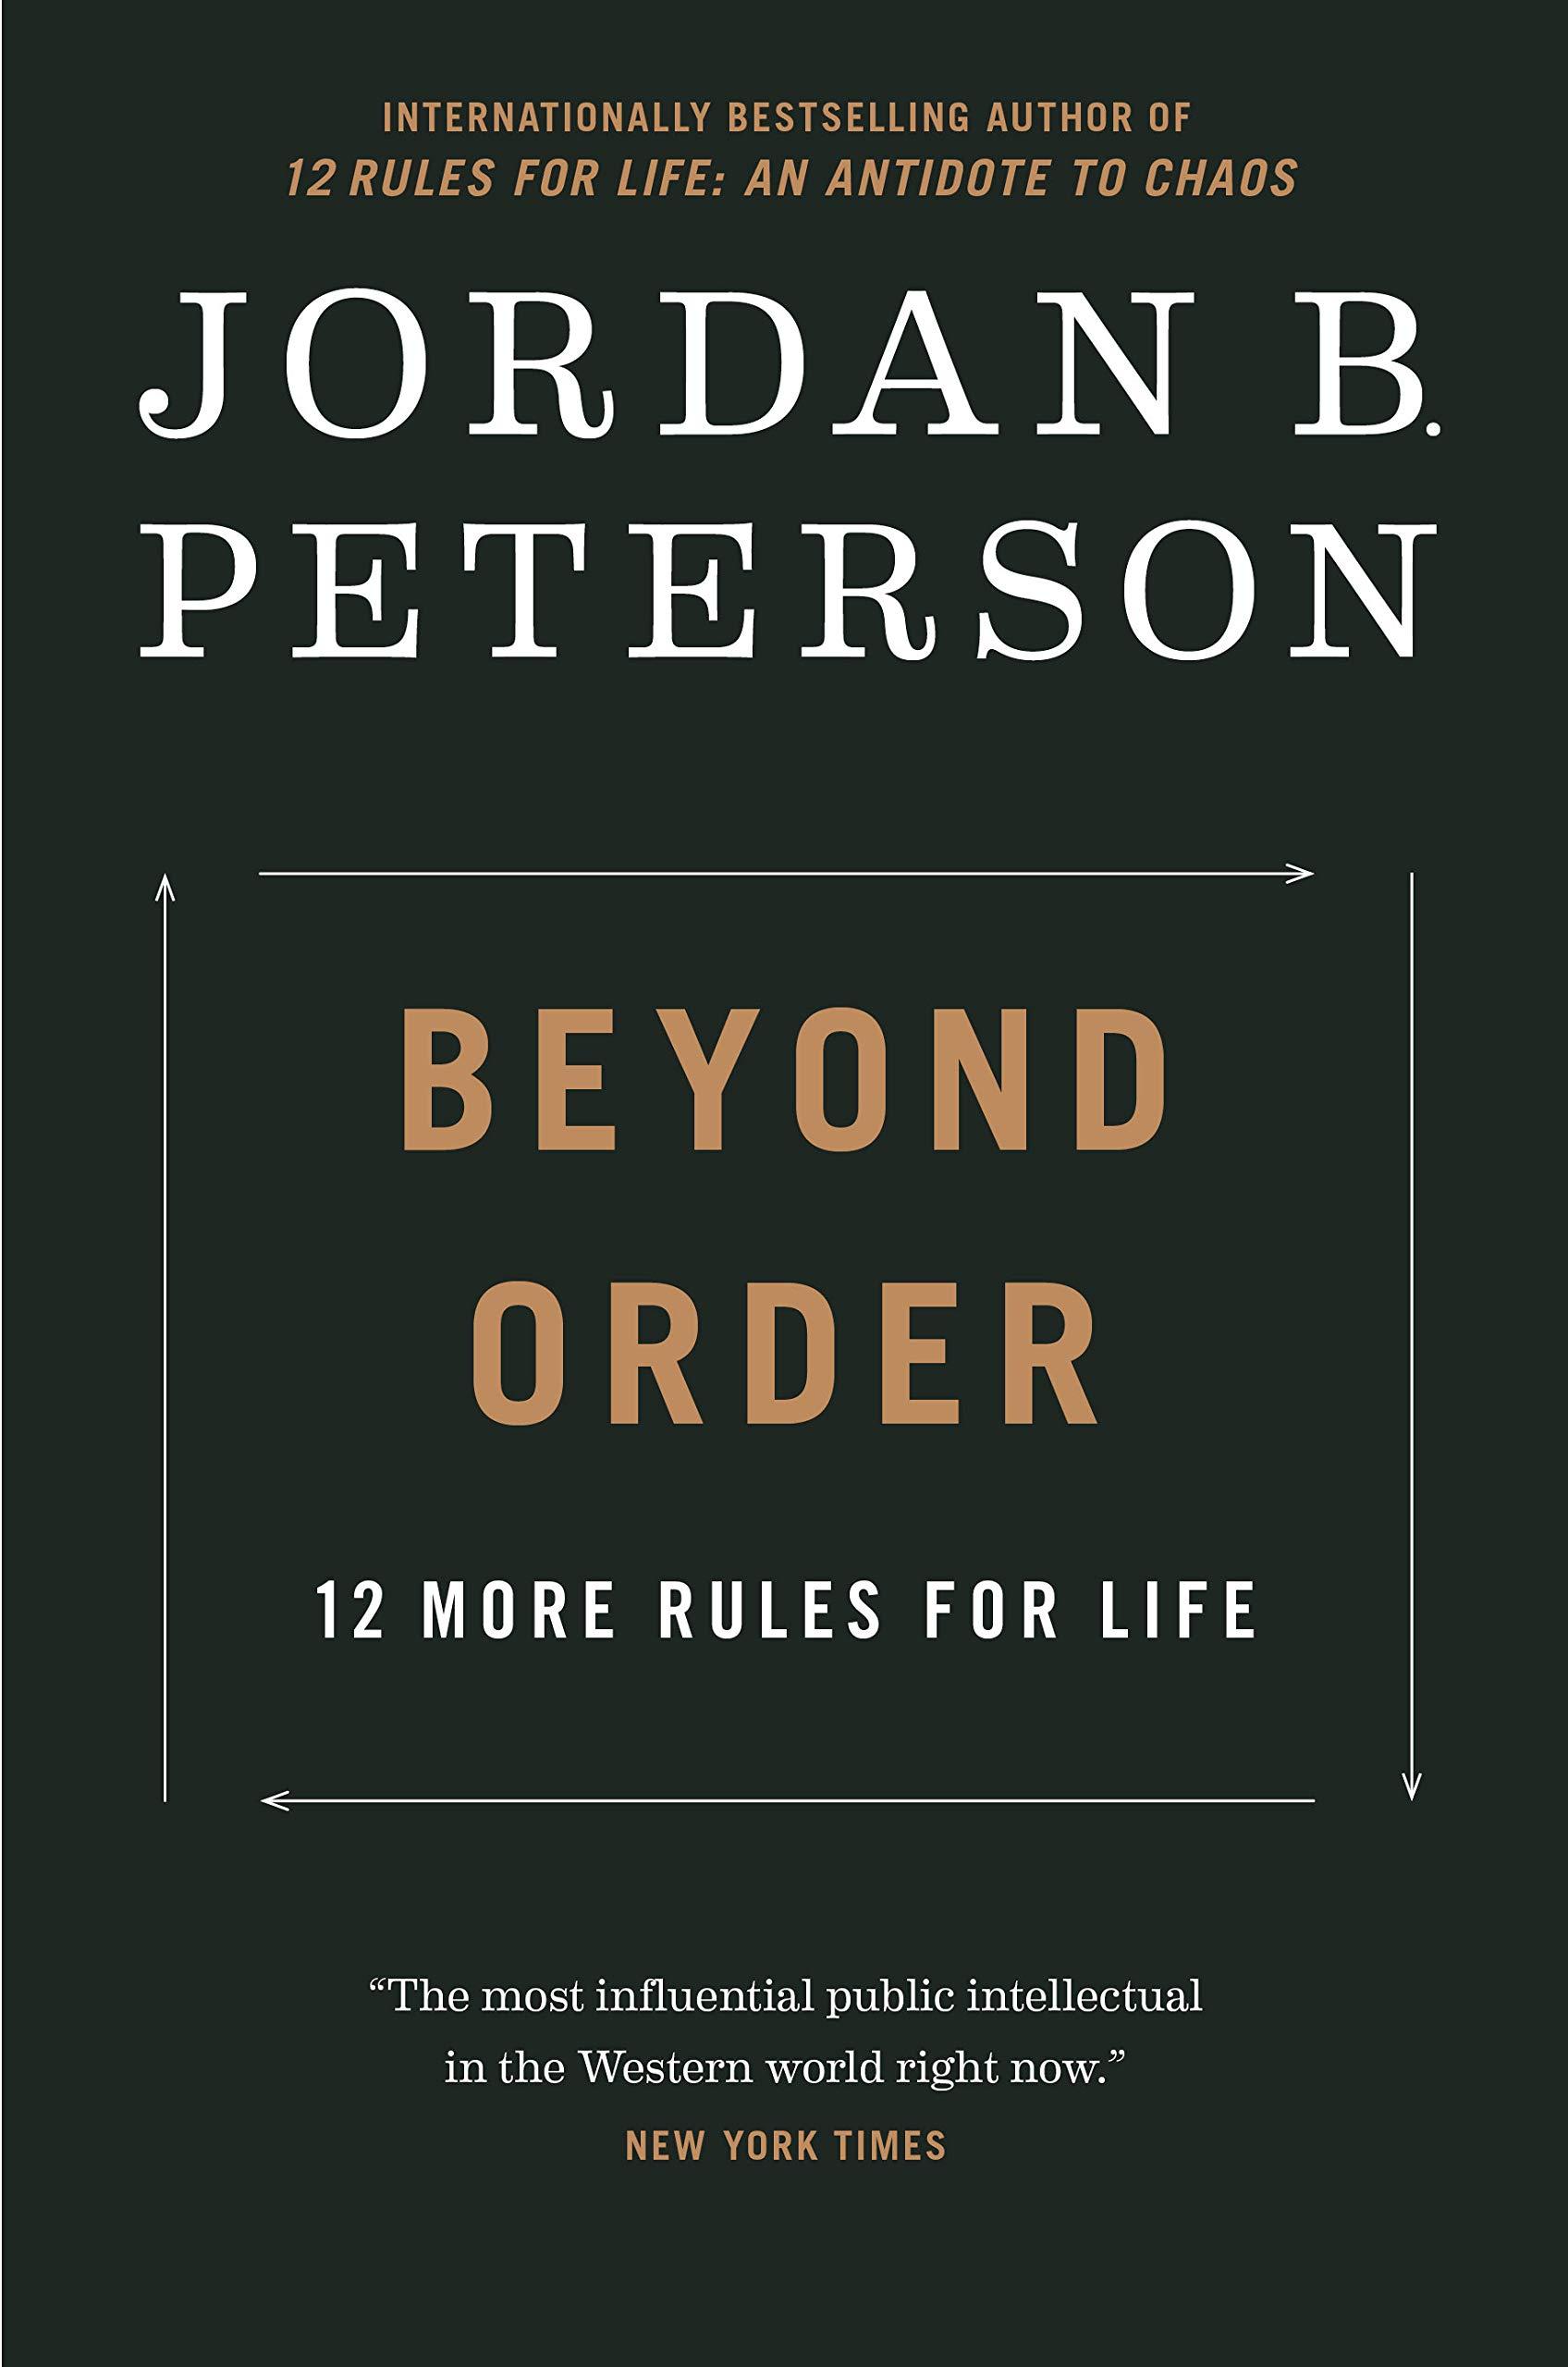 Cover image of Beyond Order by Jordan B. Peterson